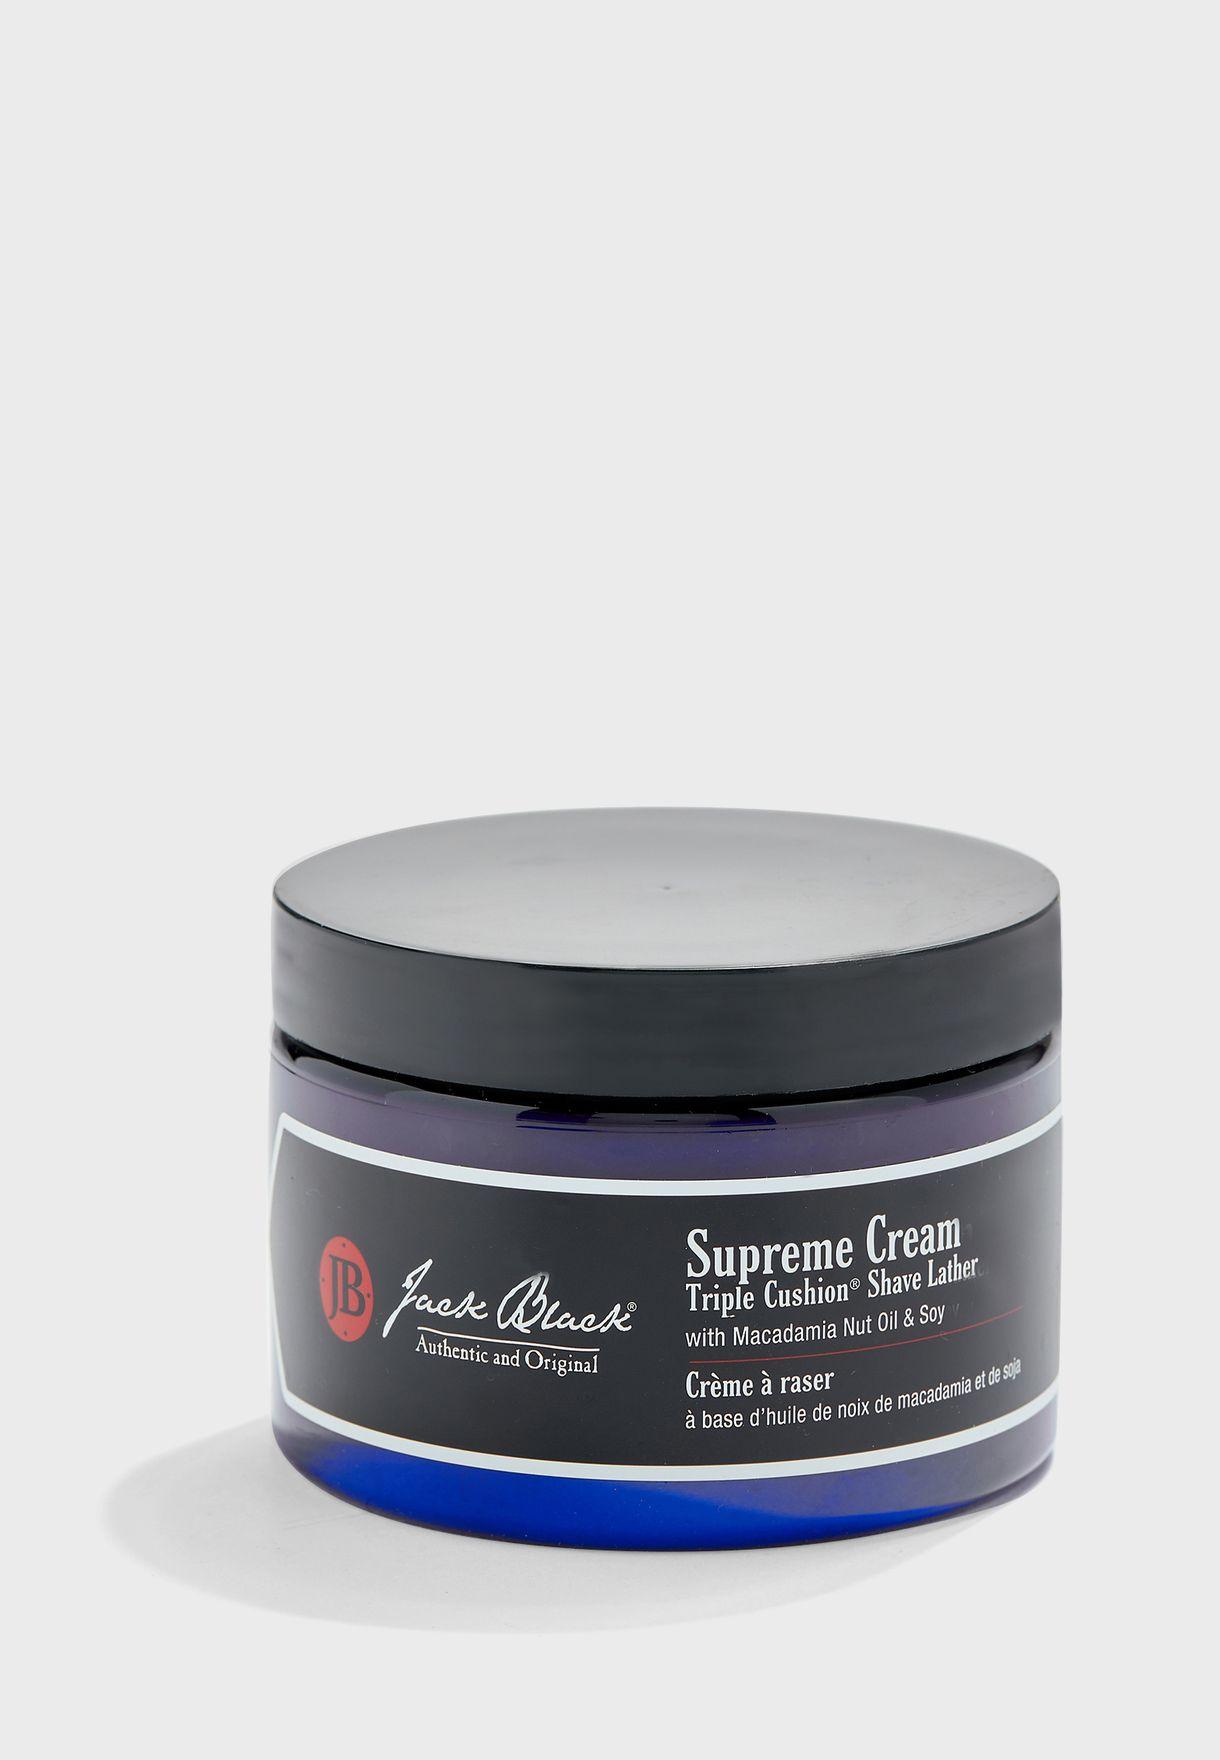 Supreme Cream Triple Cushion Shave Lather 270ml